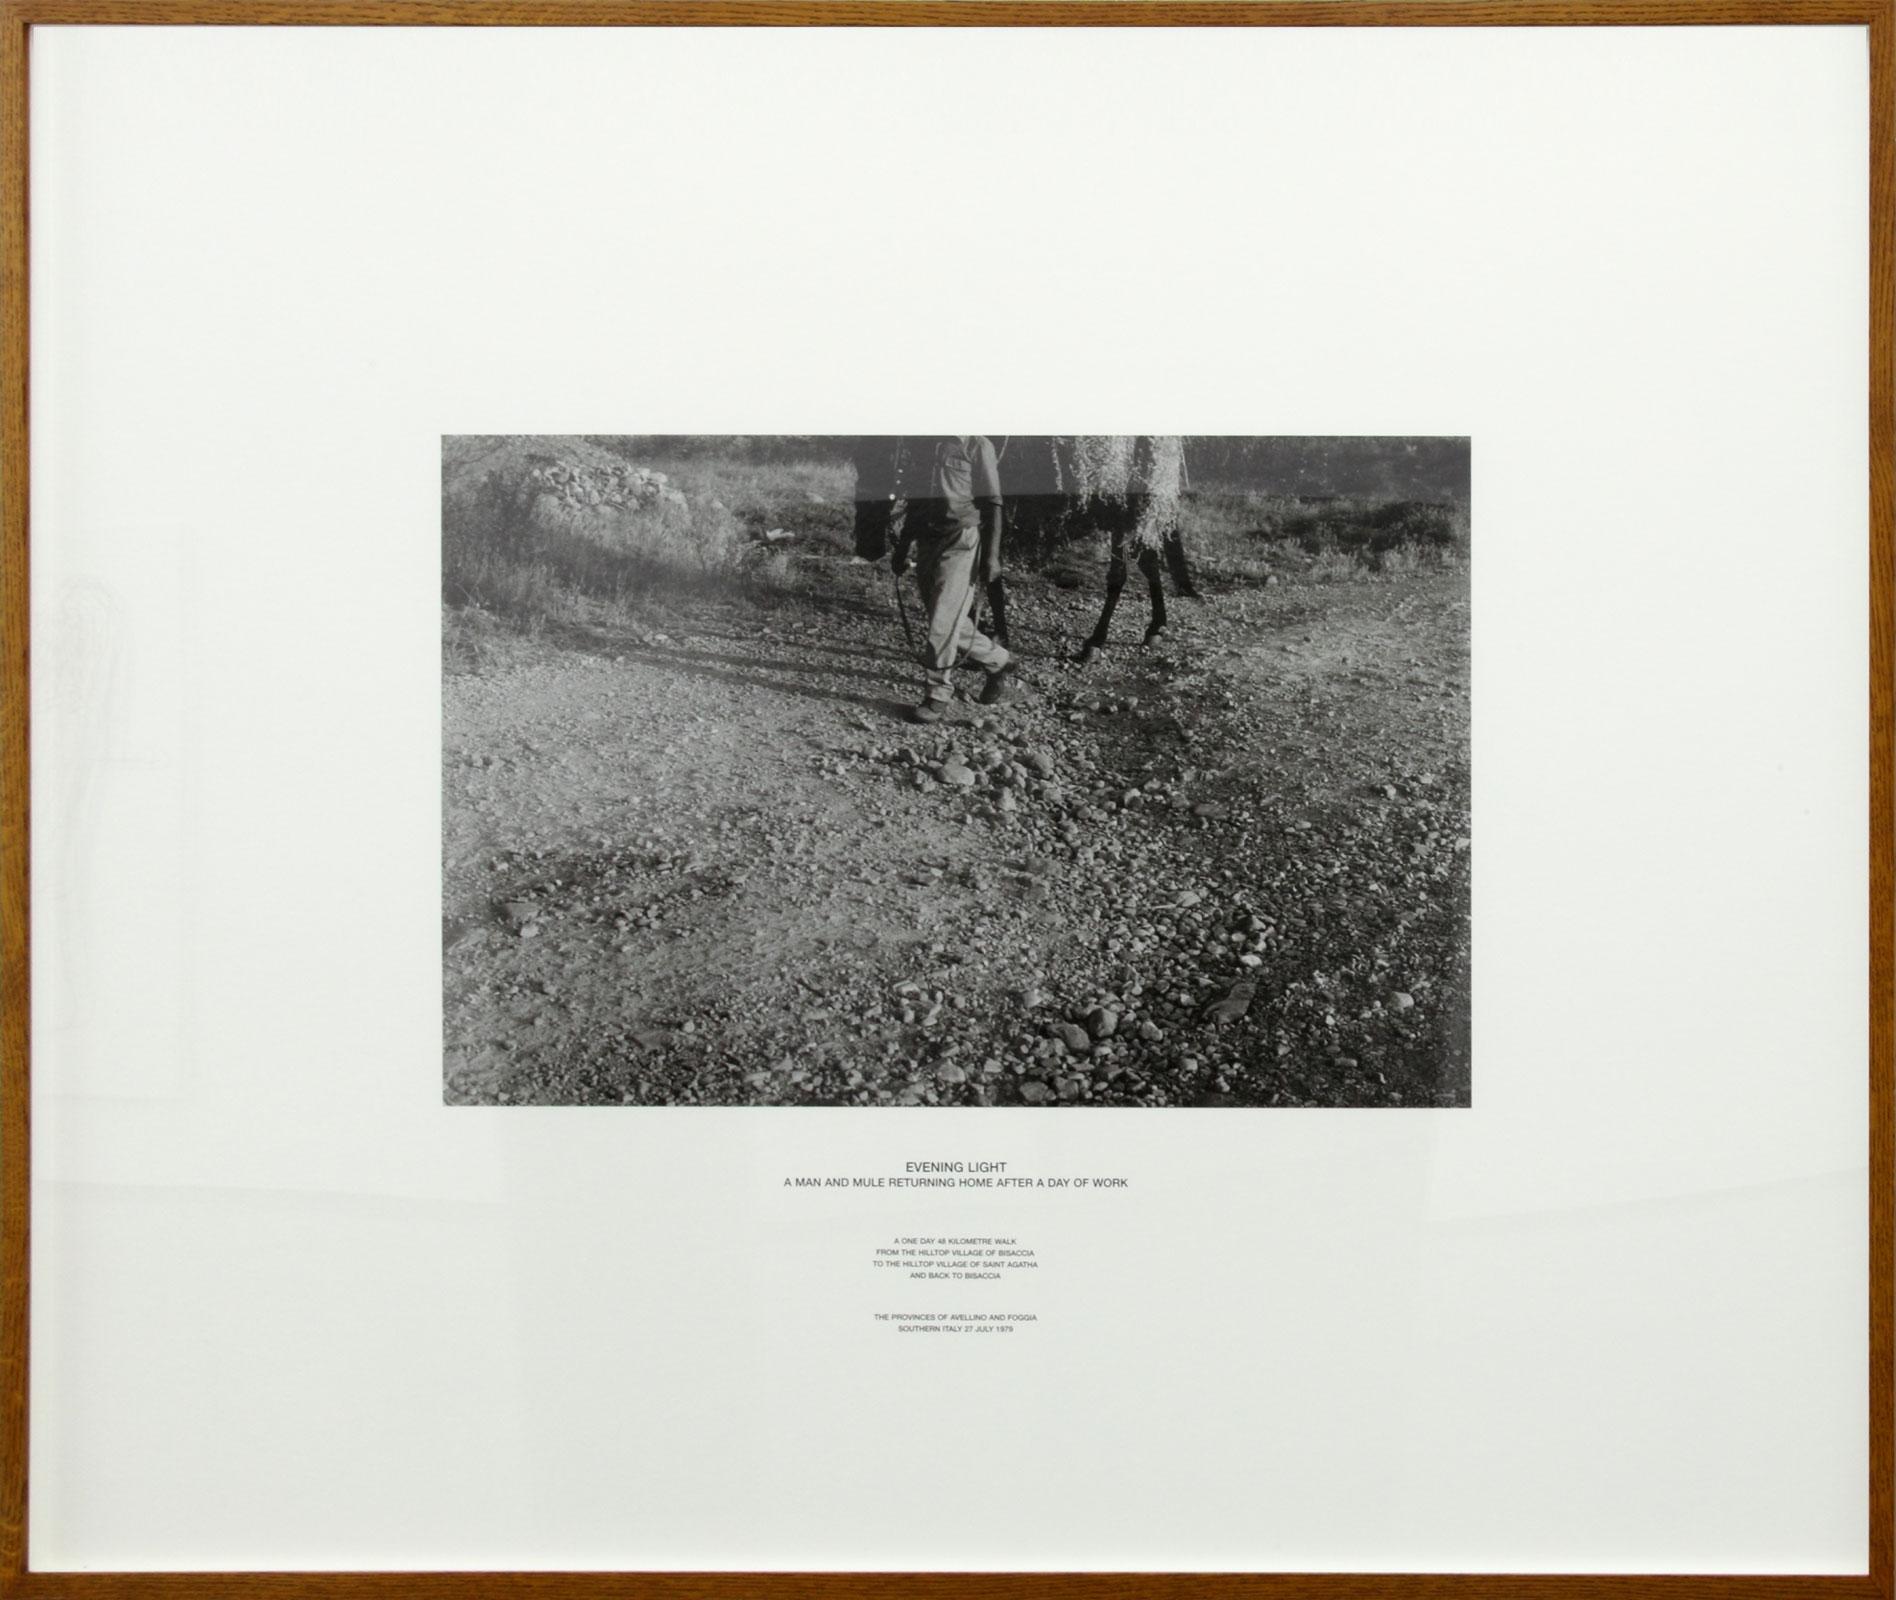 Hamish Fulton, Evening Light Italy, 1979, Framed photo-text work, 116 x 138 cm